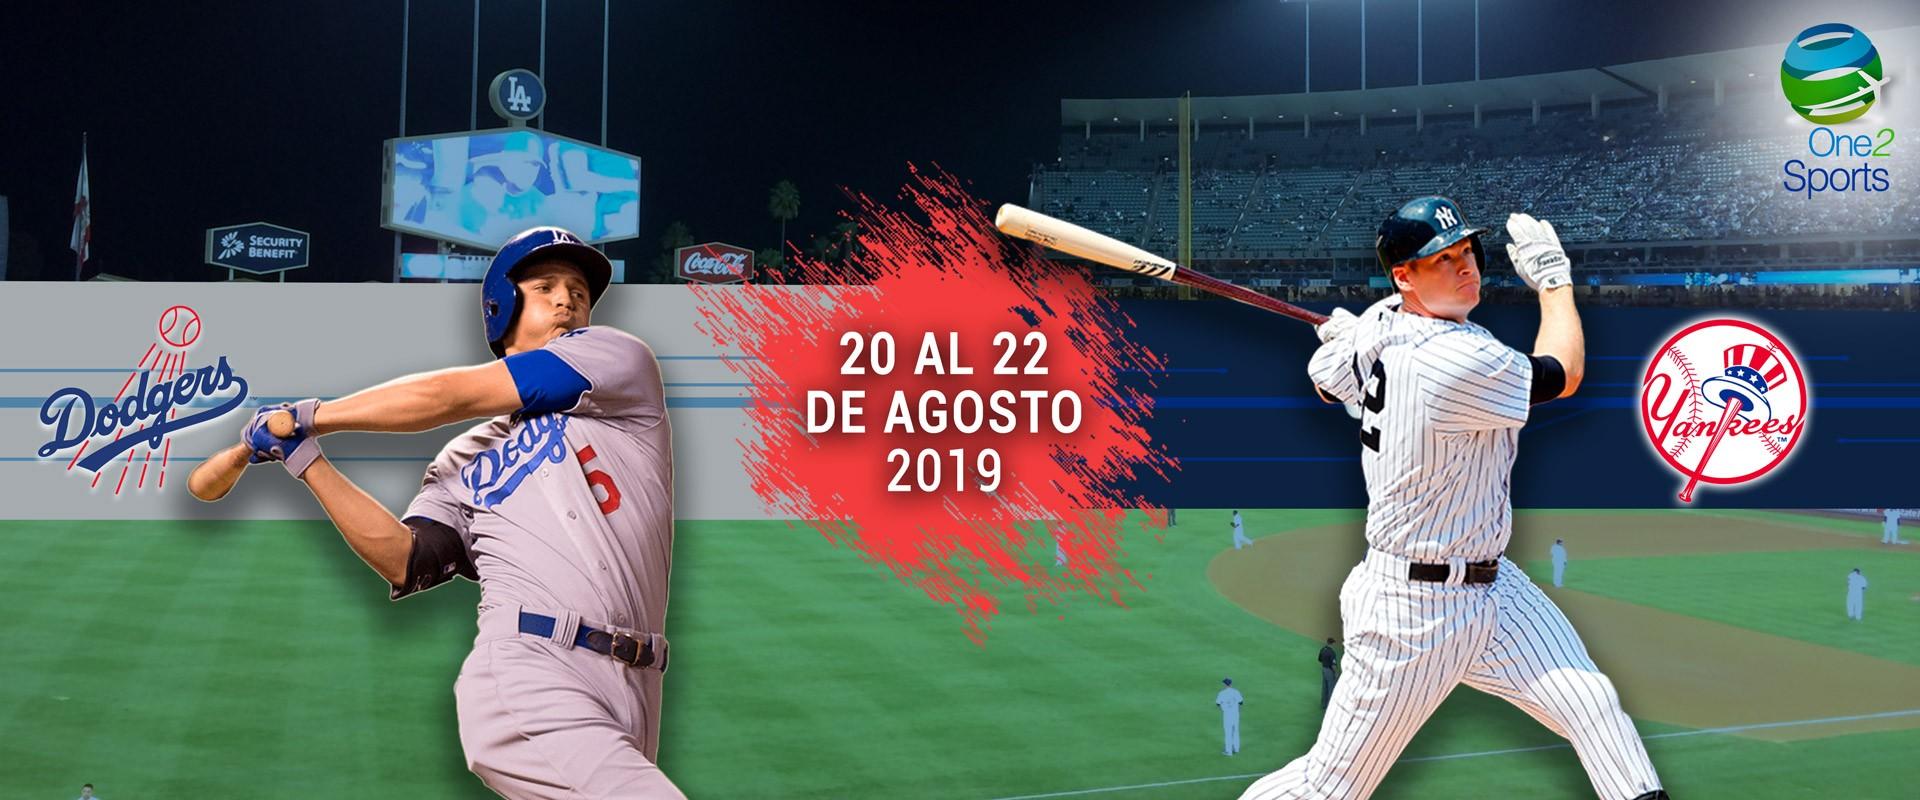 Los Angeles Dodgers vs New York Yankees